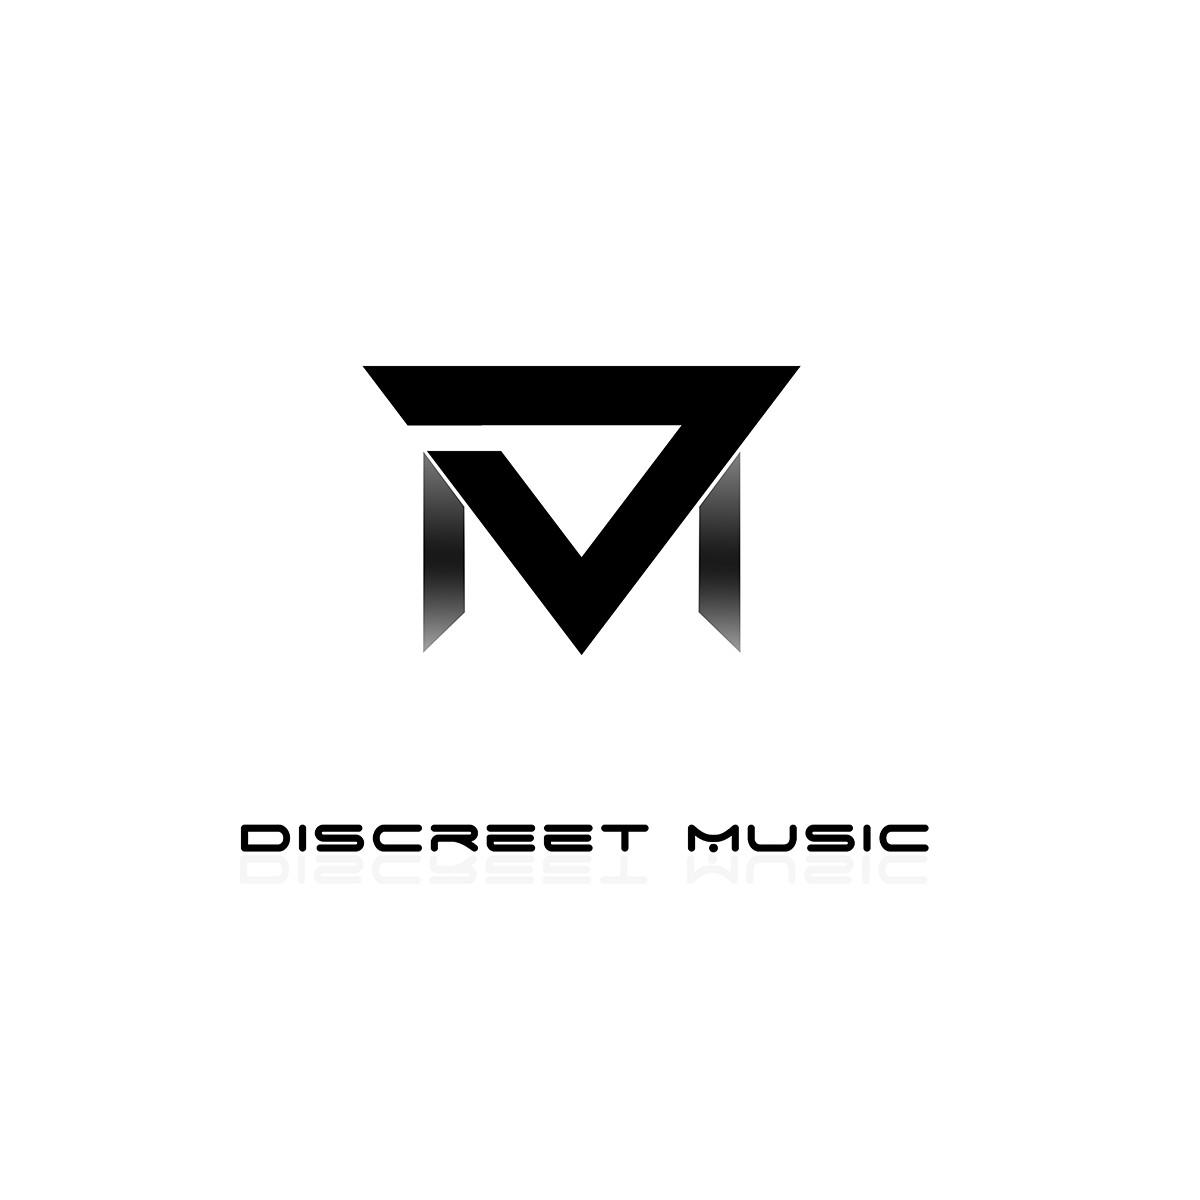 logo design by mel designer for discreet music design 11404061